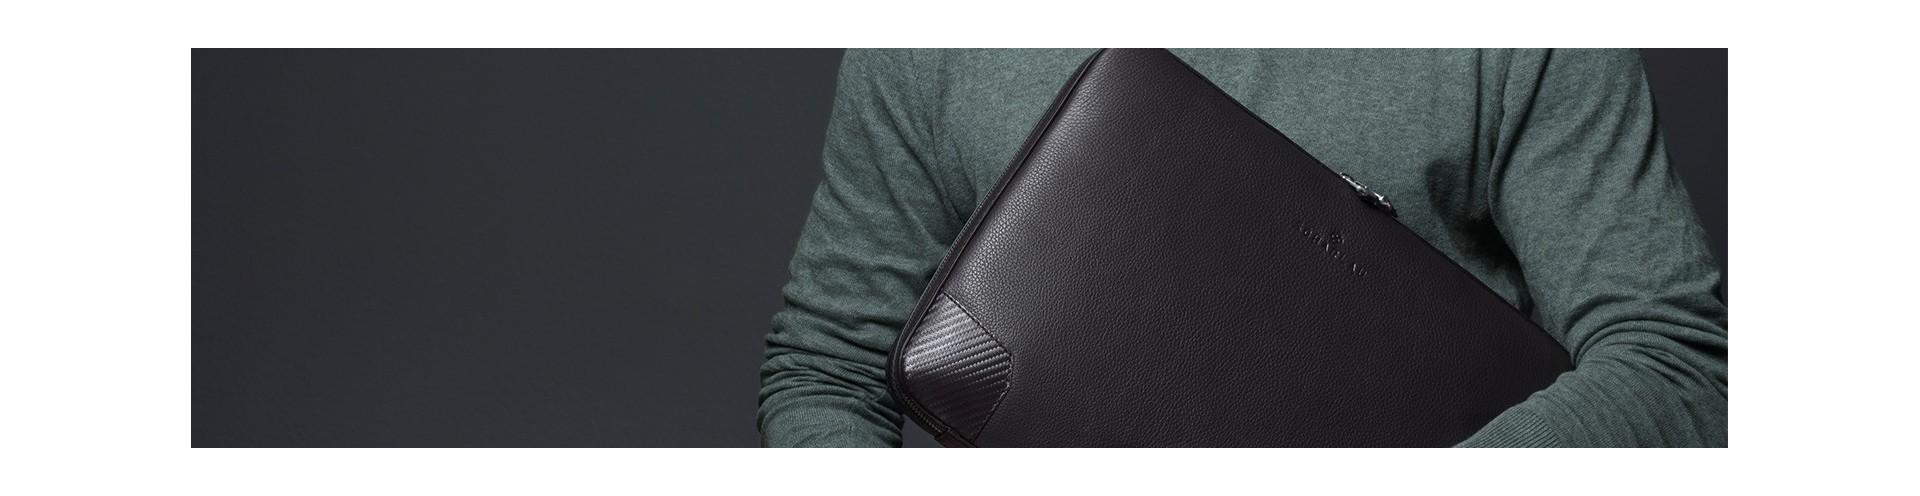 Leather Customizable Portafolios for Laptop